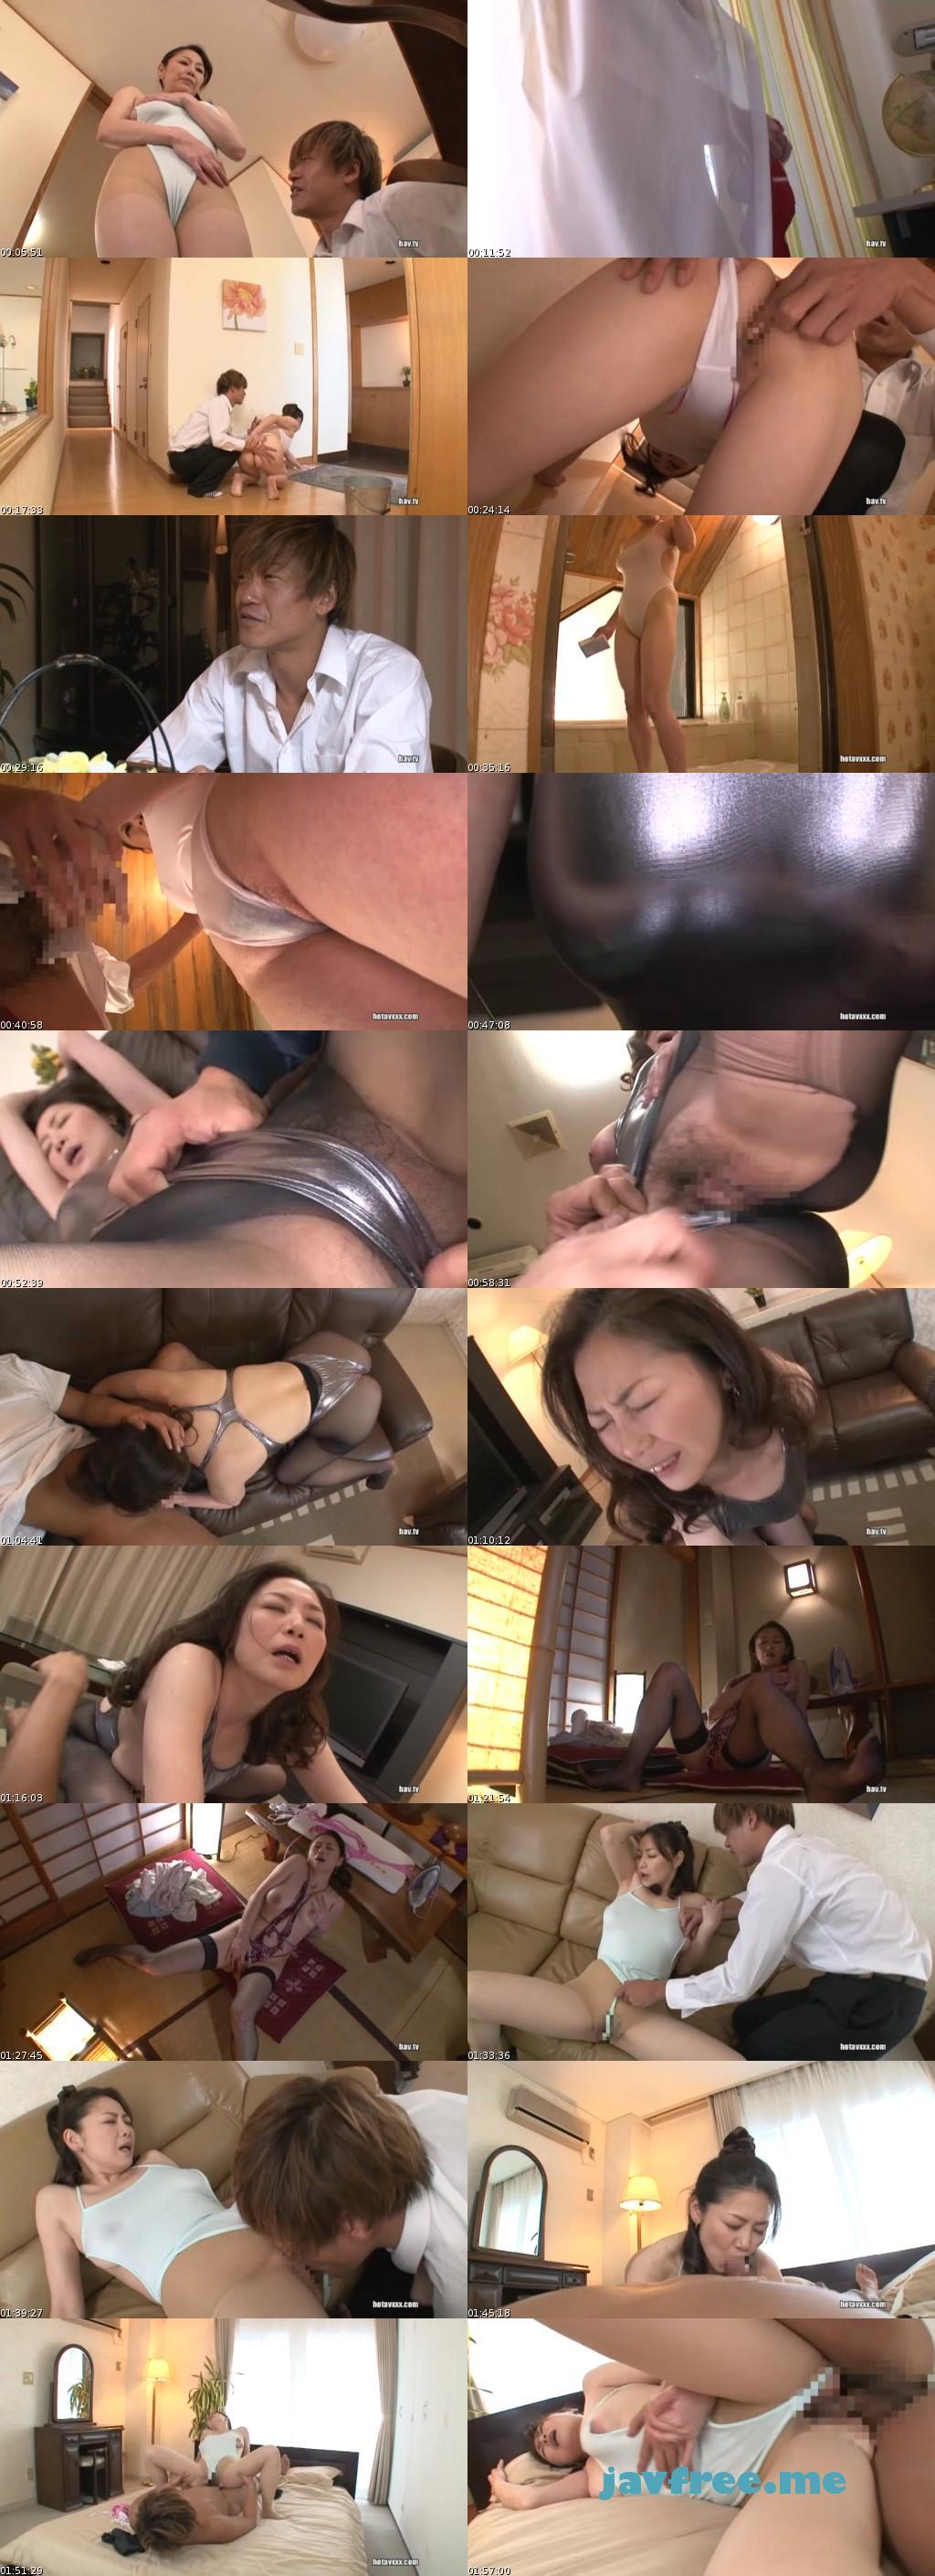 [SPRD-649] はいれぐ母さん 沢村麻耶 - image SPRD-649 on https://javfree.me